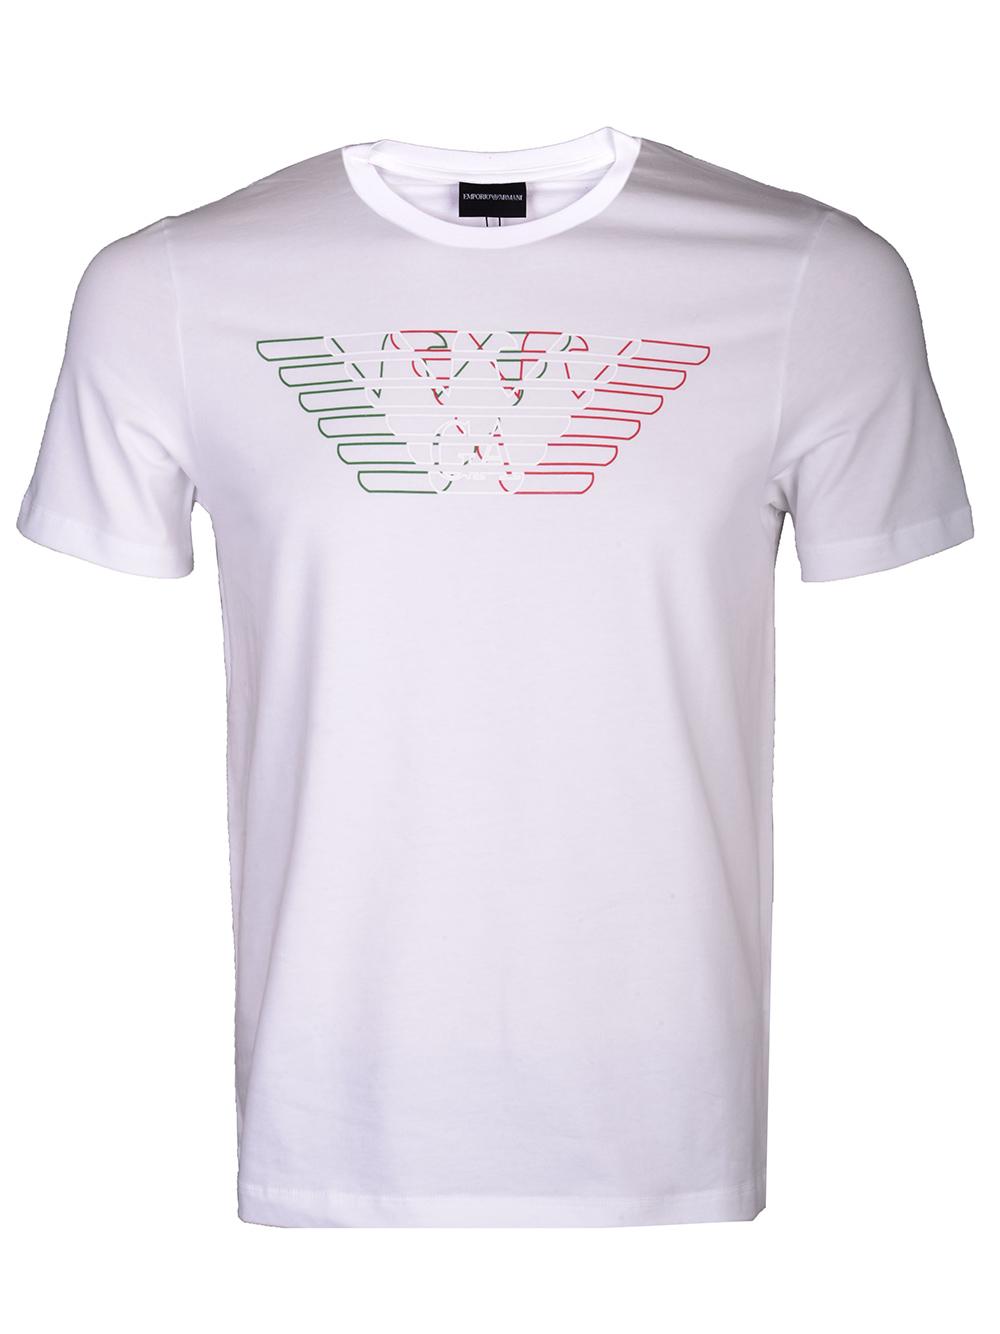 EMPORIO ARMANI Μπλούζα T-shirt 3H1T71 1J11Z-0100 ΛΕΥΚΟ